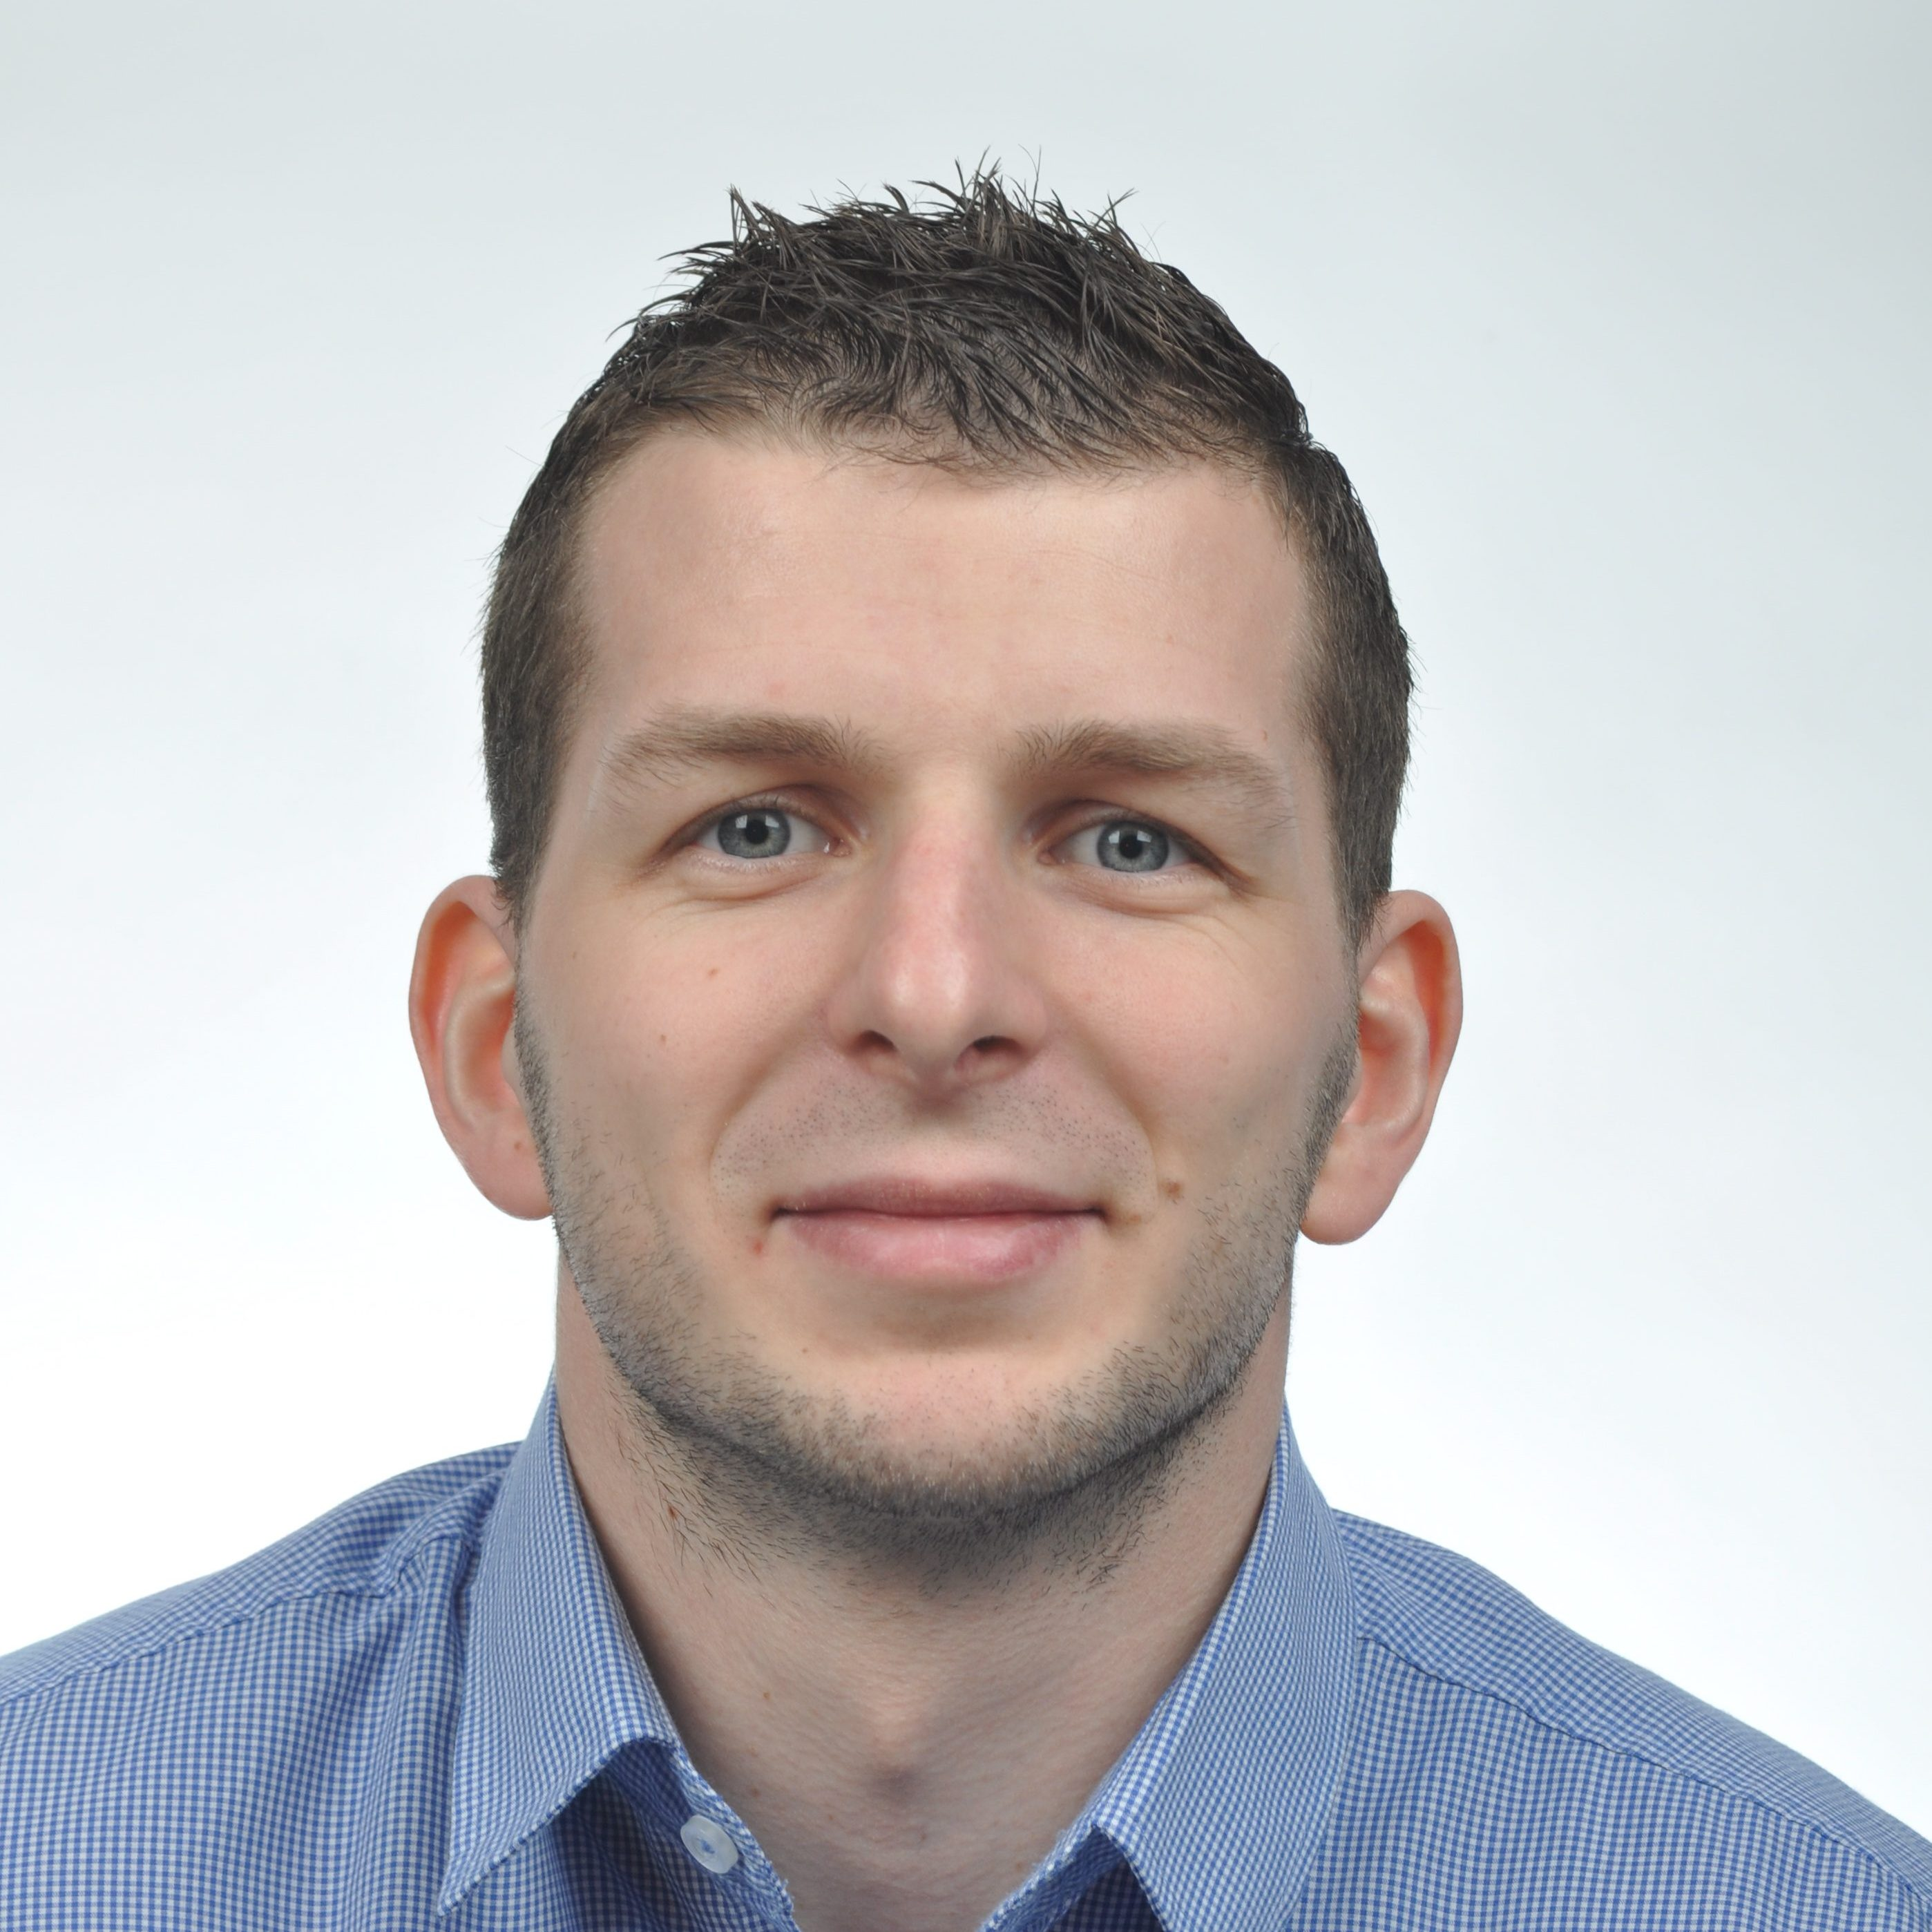 Tomasz Wegyrzn, Participant, LEAP Intermediate 2016; Member, oikos Opole, Poland